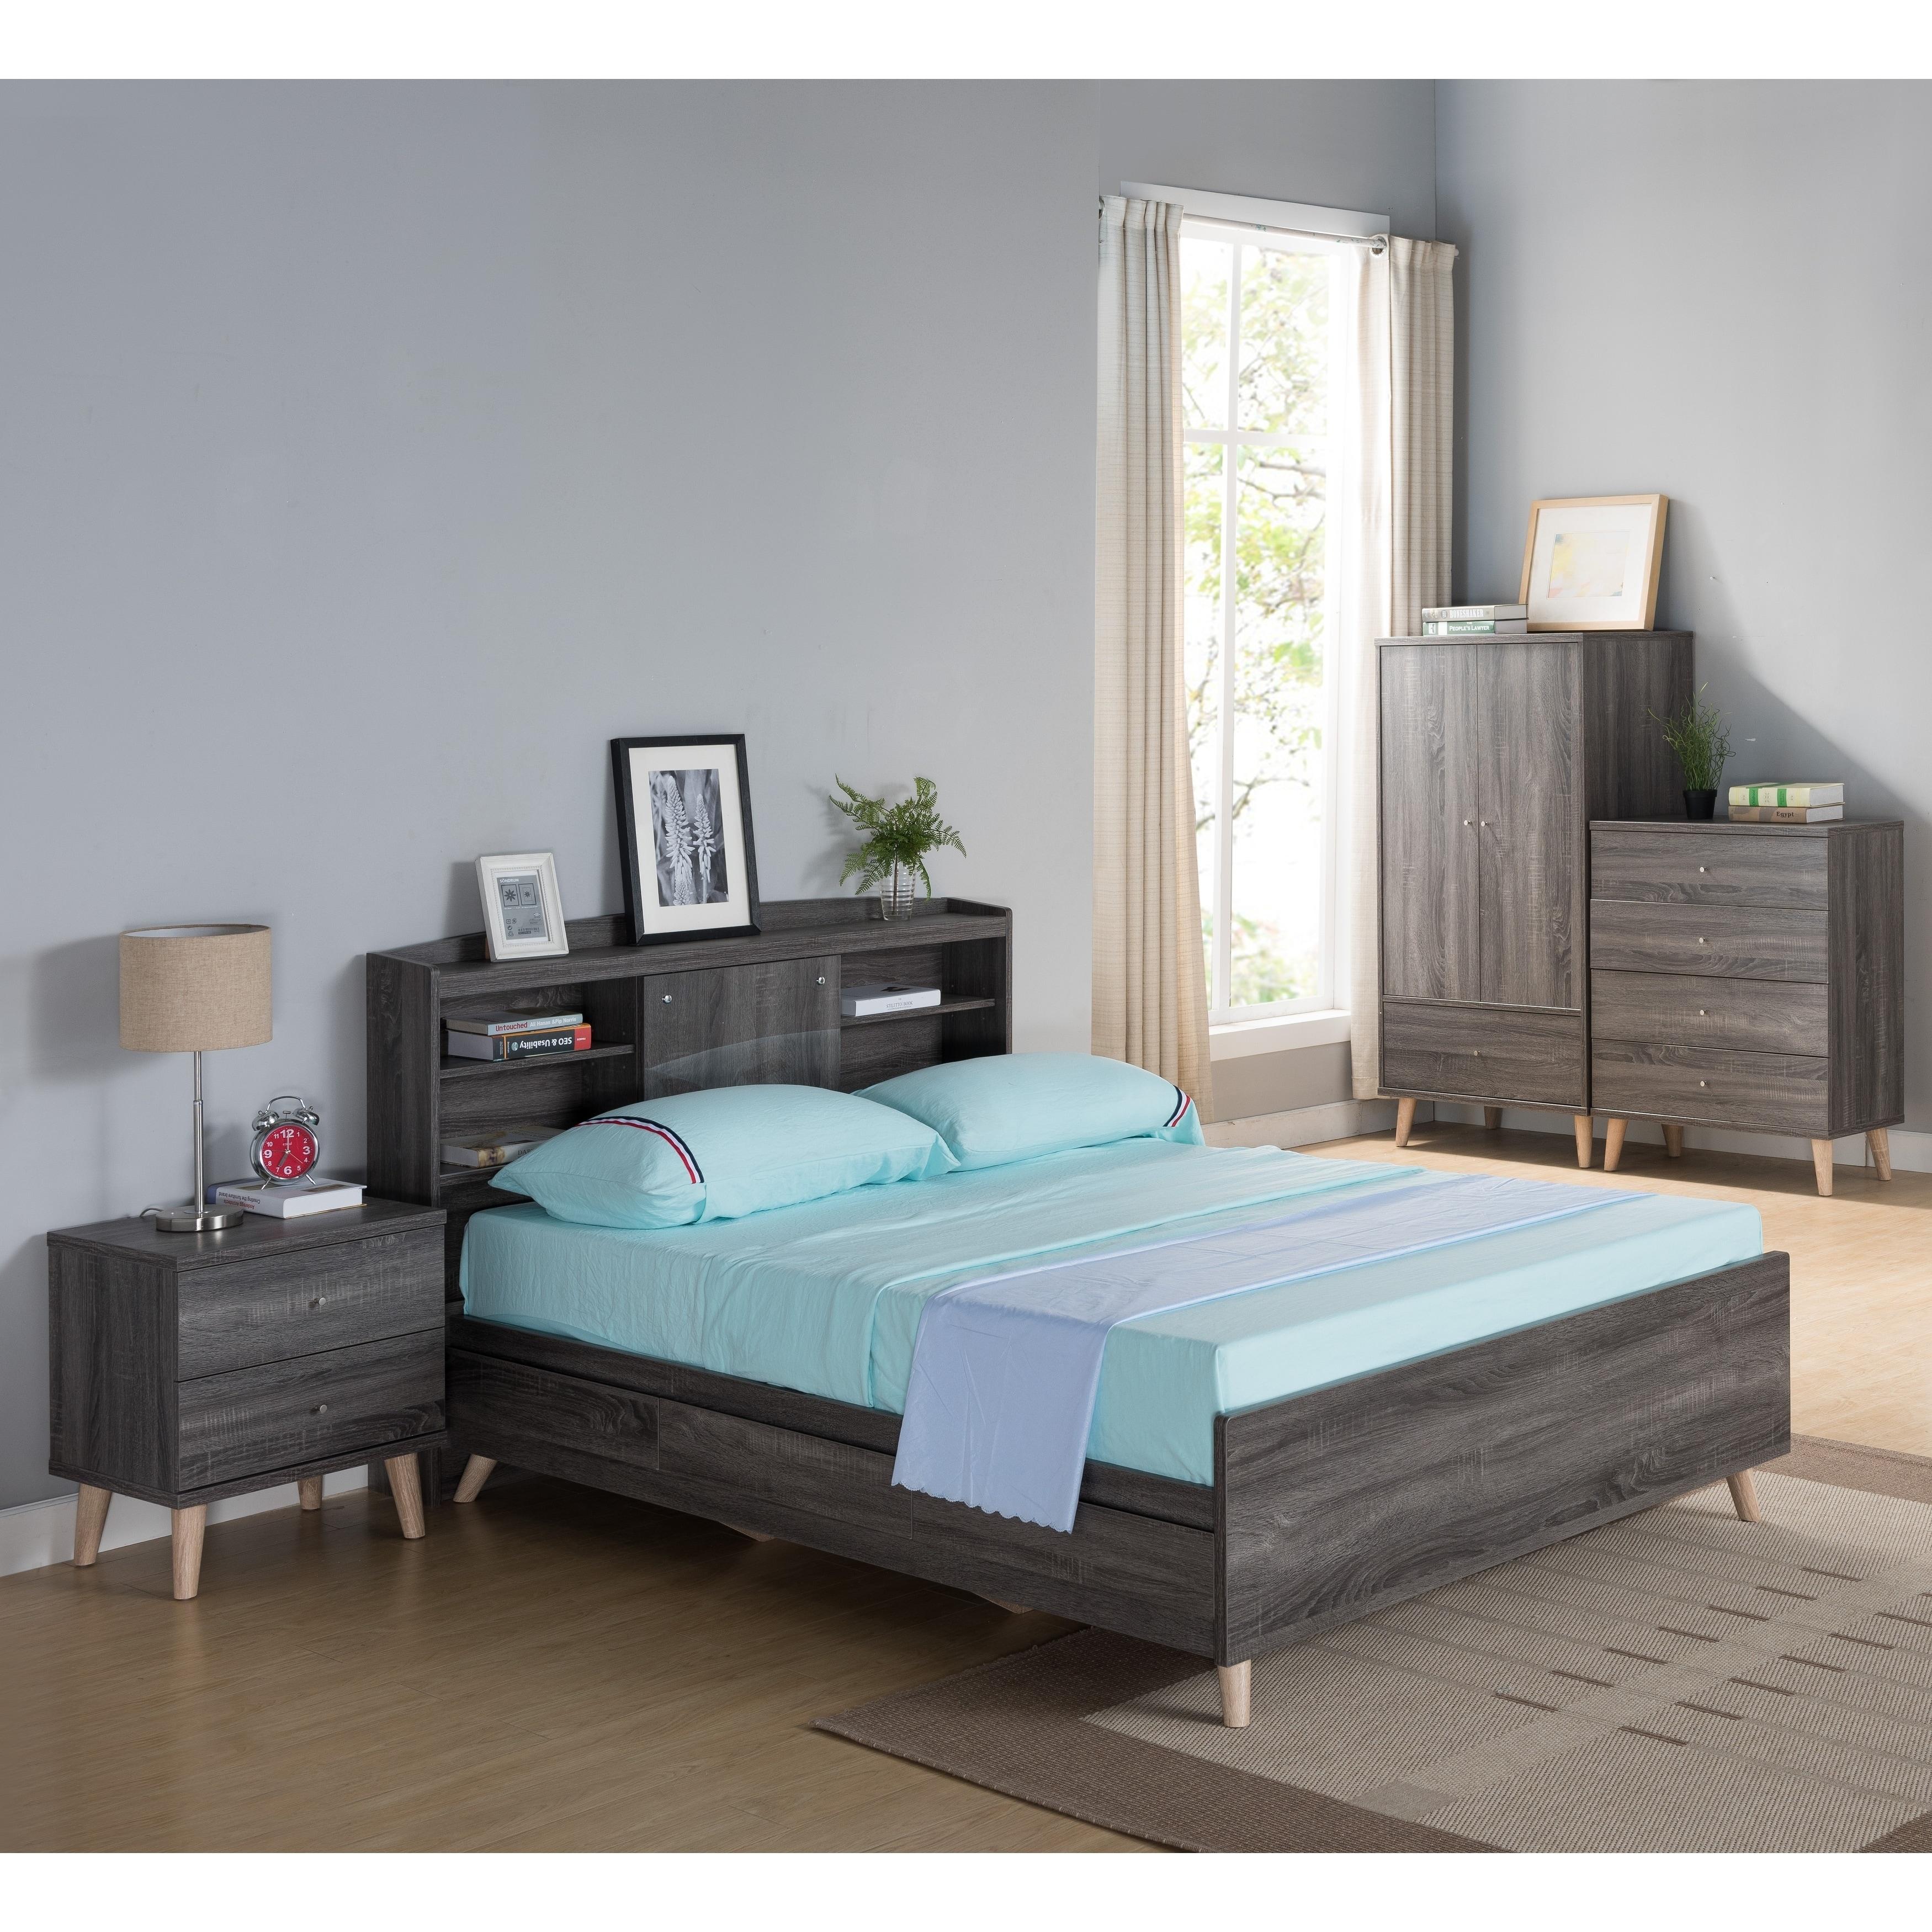 Shop Riley Contemporary Distressed Grey Platform Storage Bed With